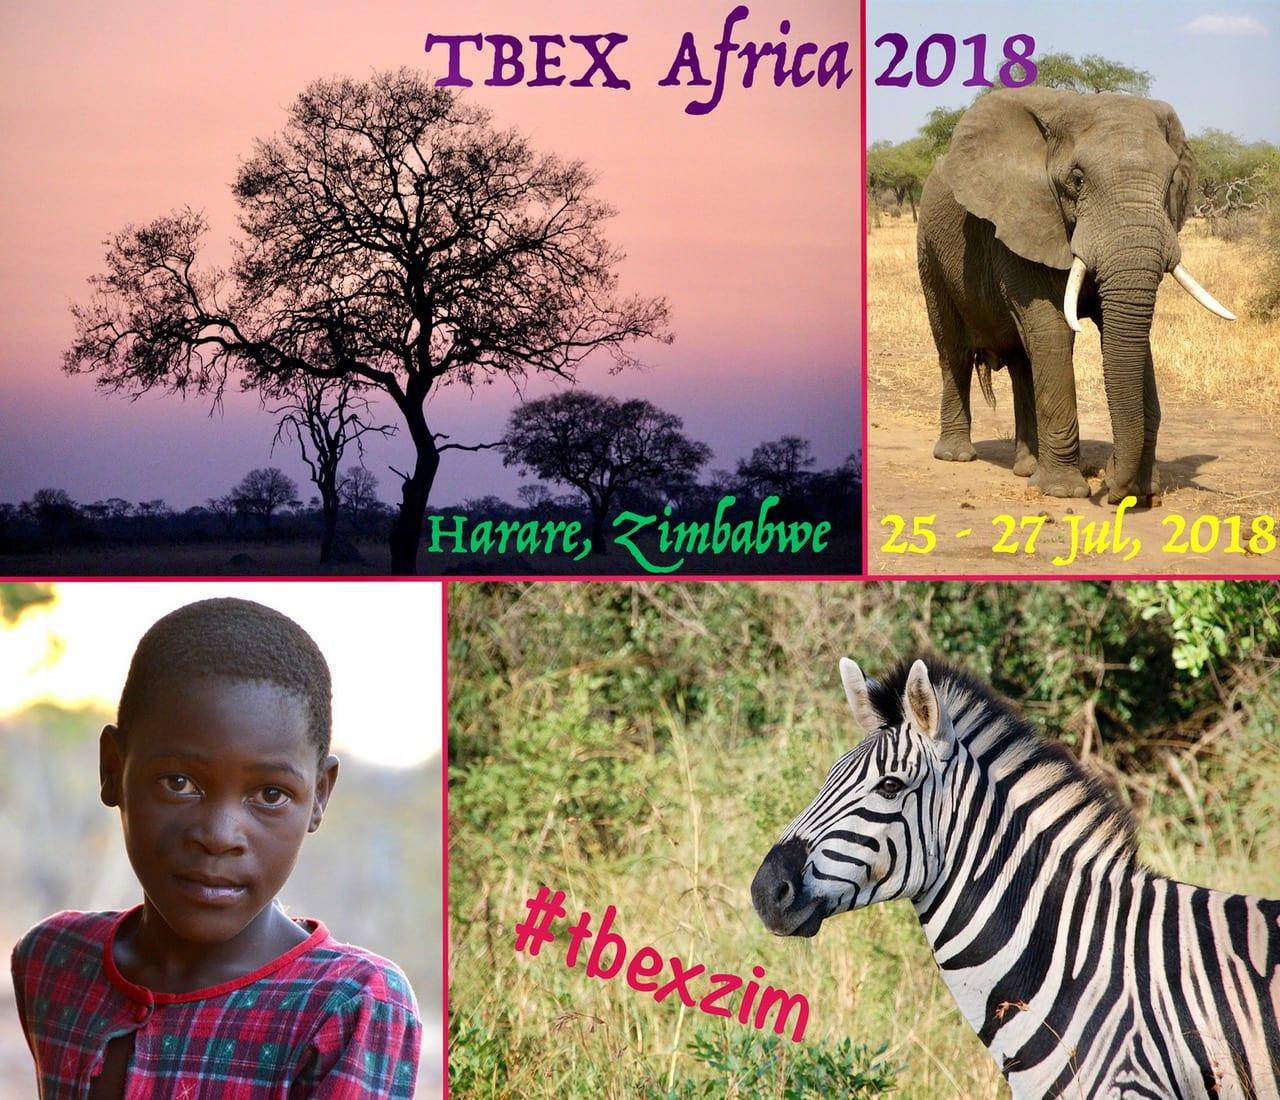 TBEX Africa 2018 in Harare, Zimbabwe